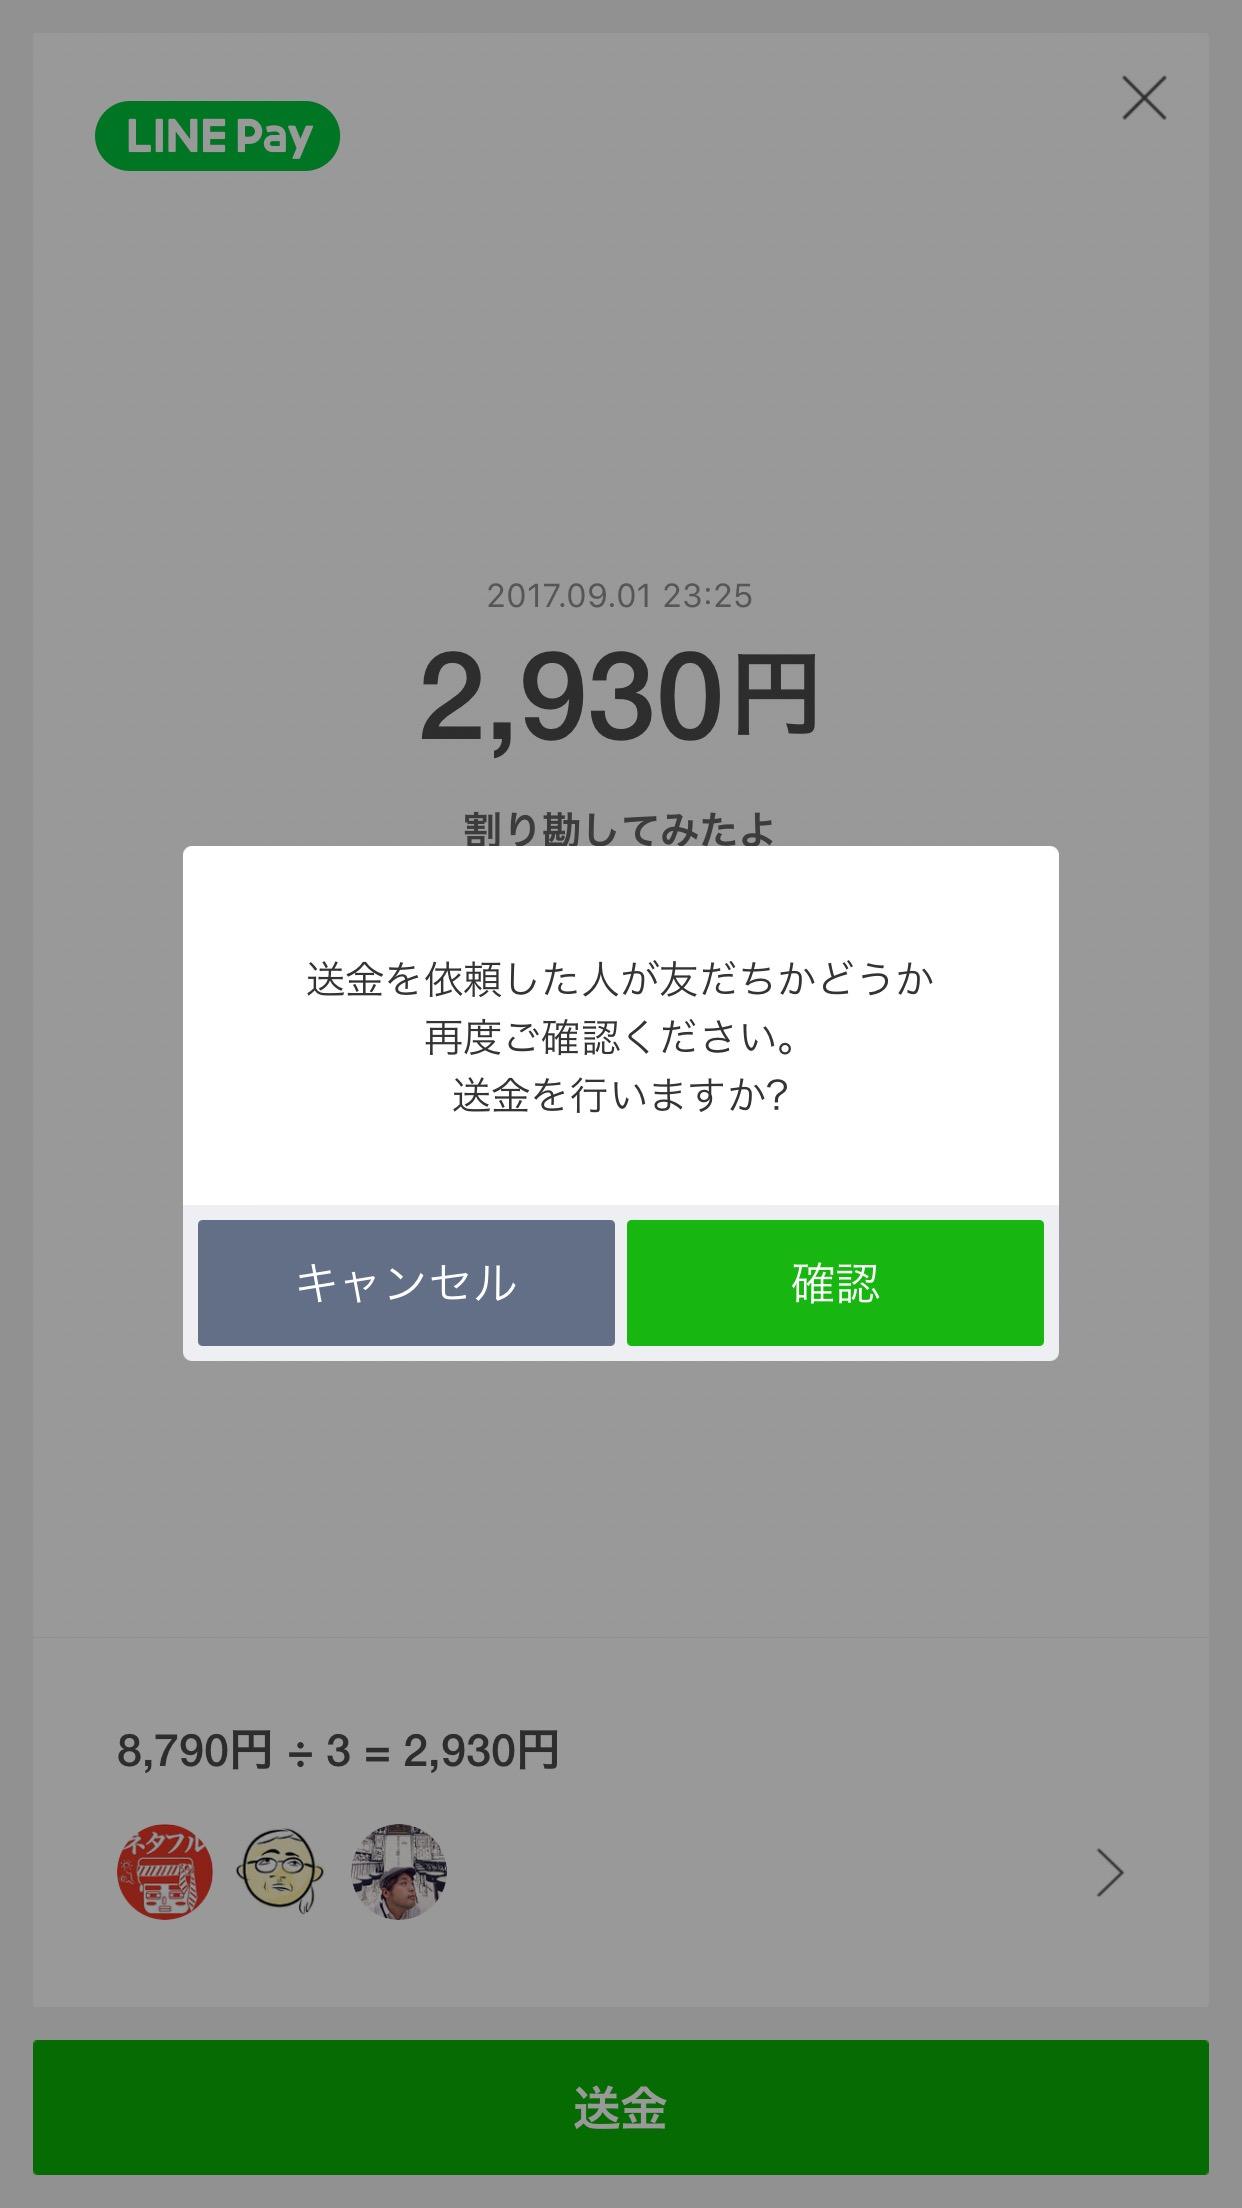 Line pay warikan 6782